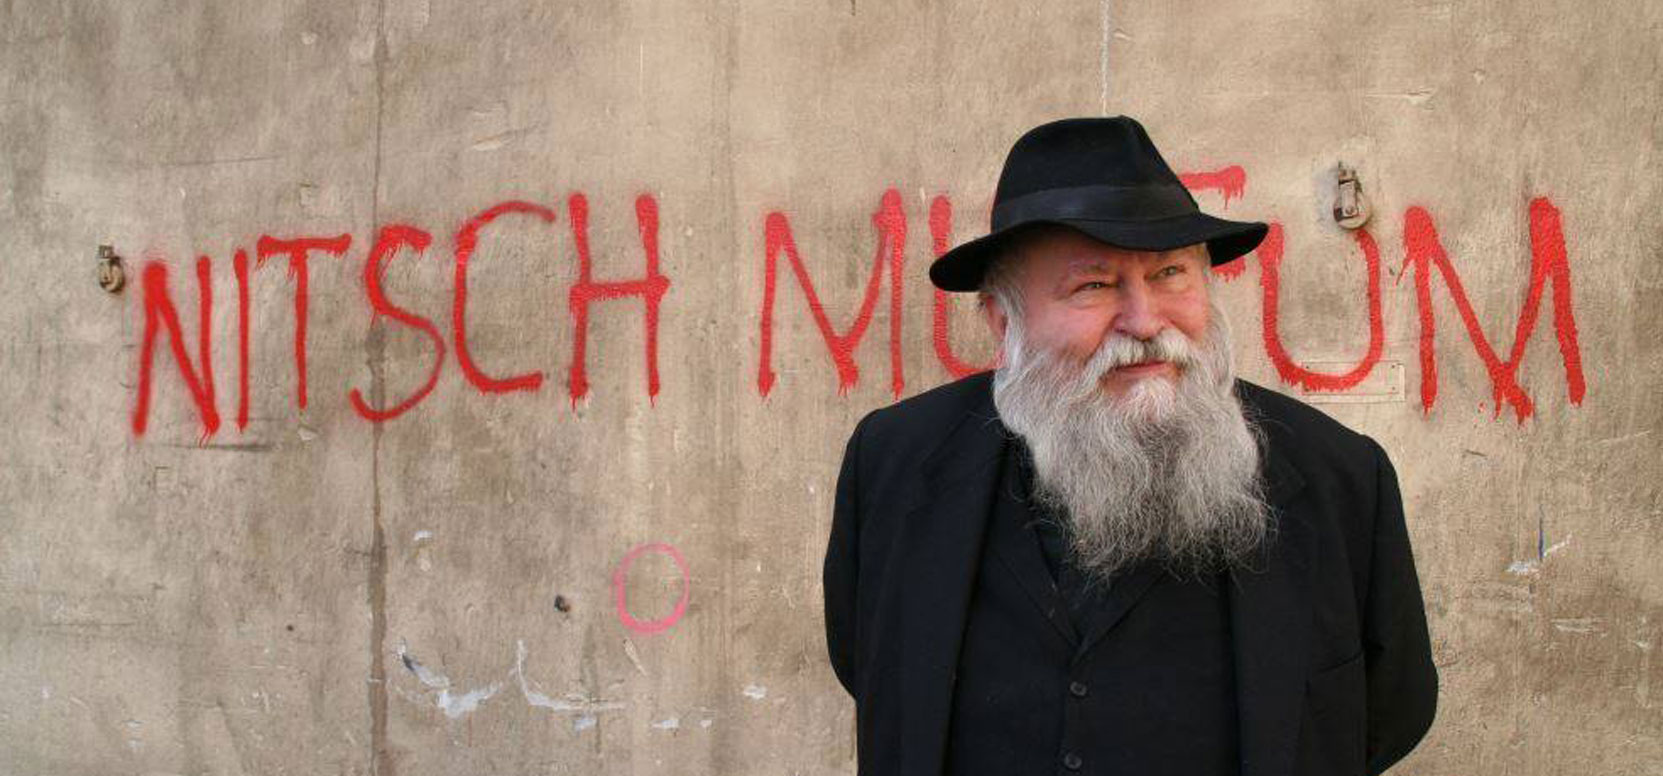 Hermann Nitsch © Heinz Cibulka